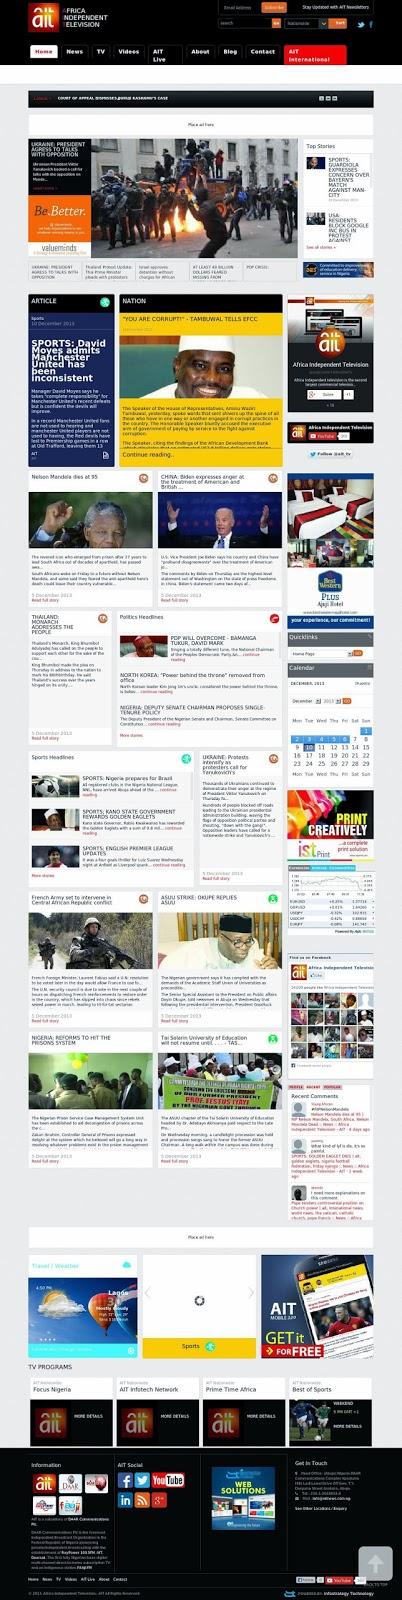 www.aitonline.tv